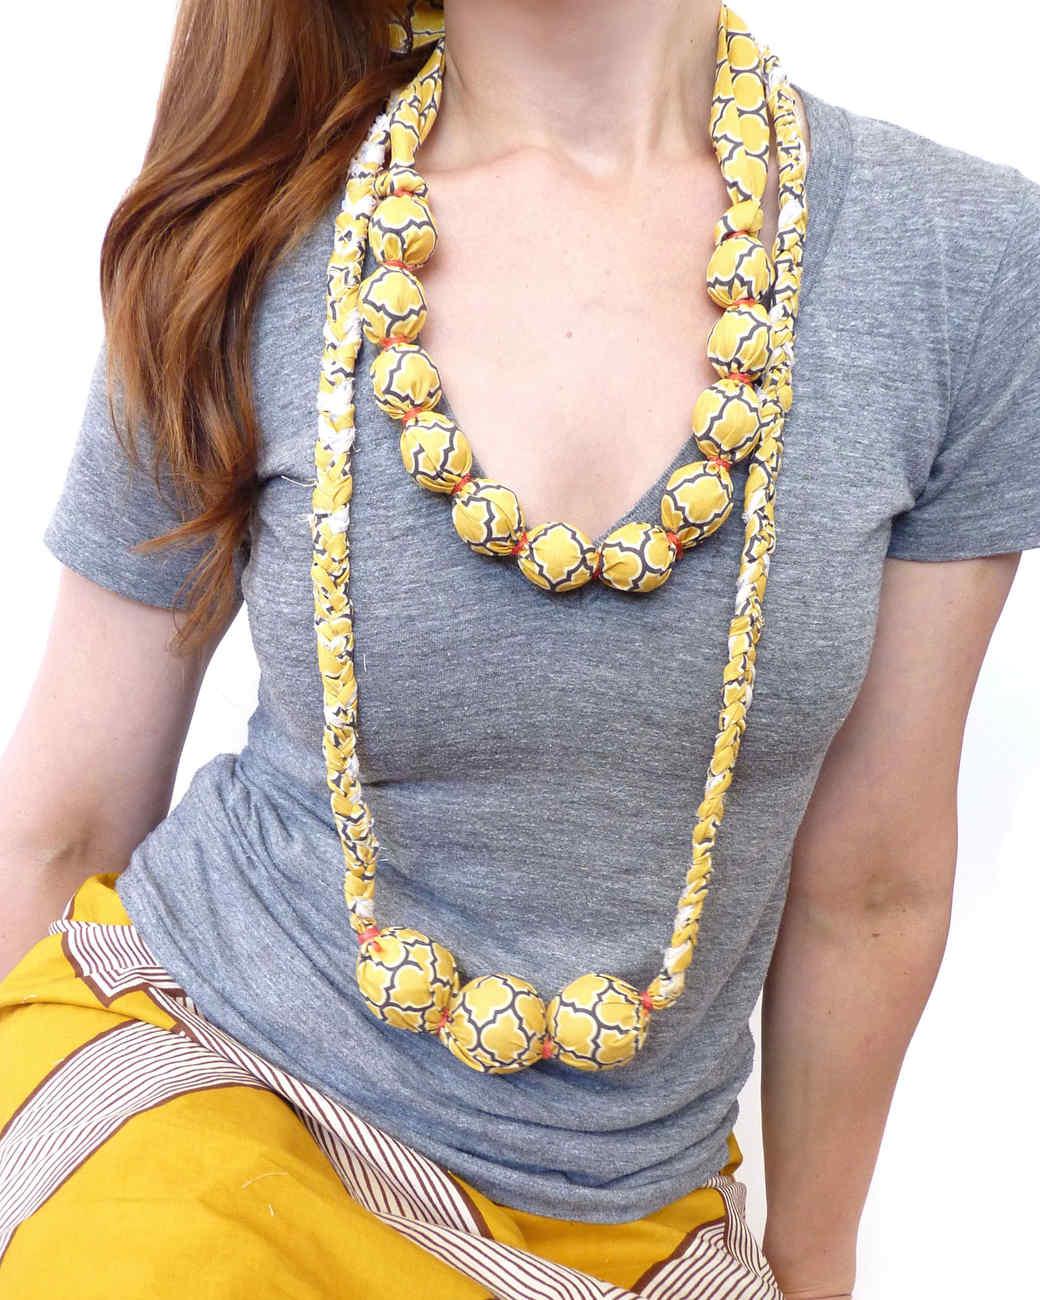 fabric-bead-necklace-1-tm-1114.jpg